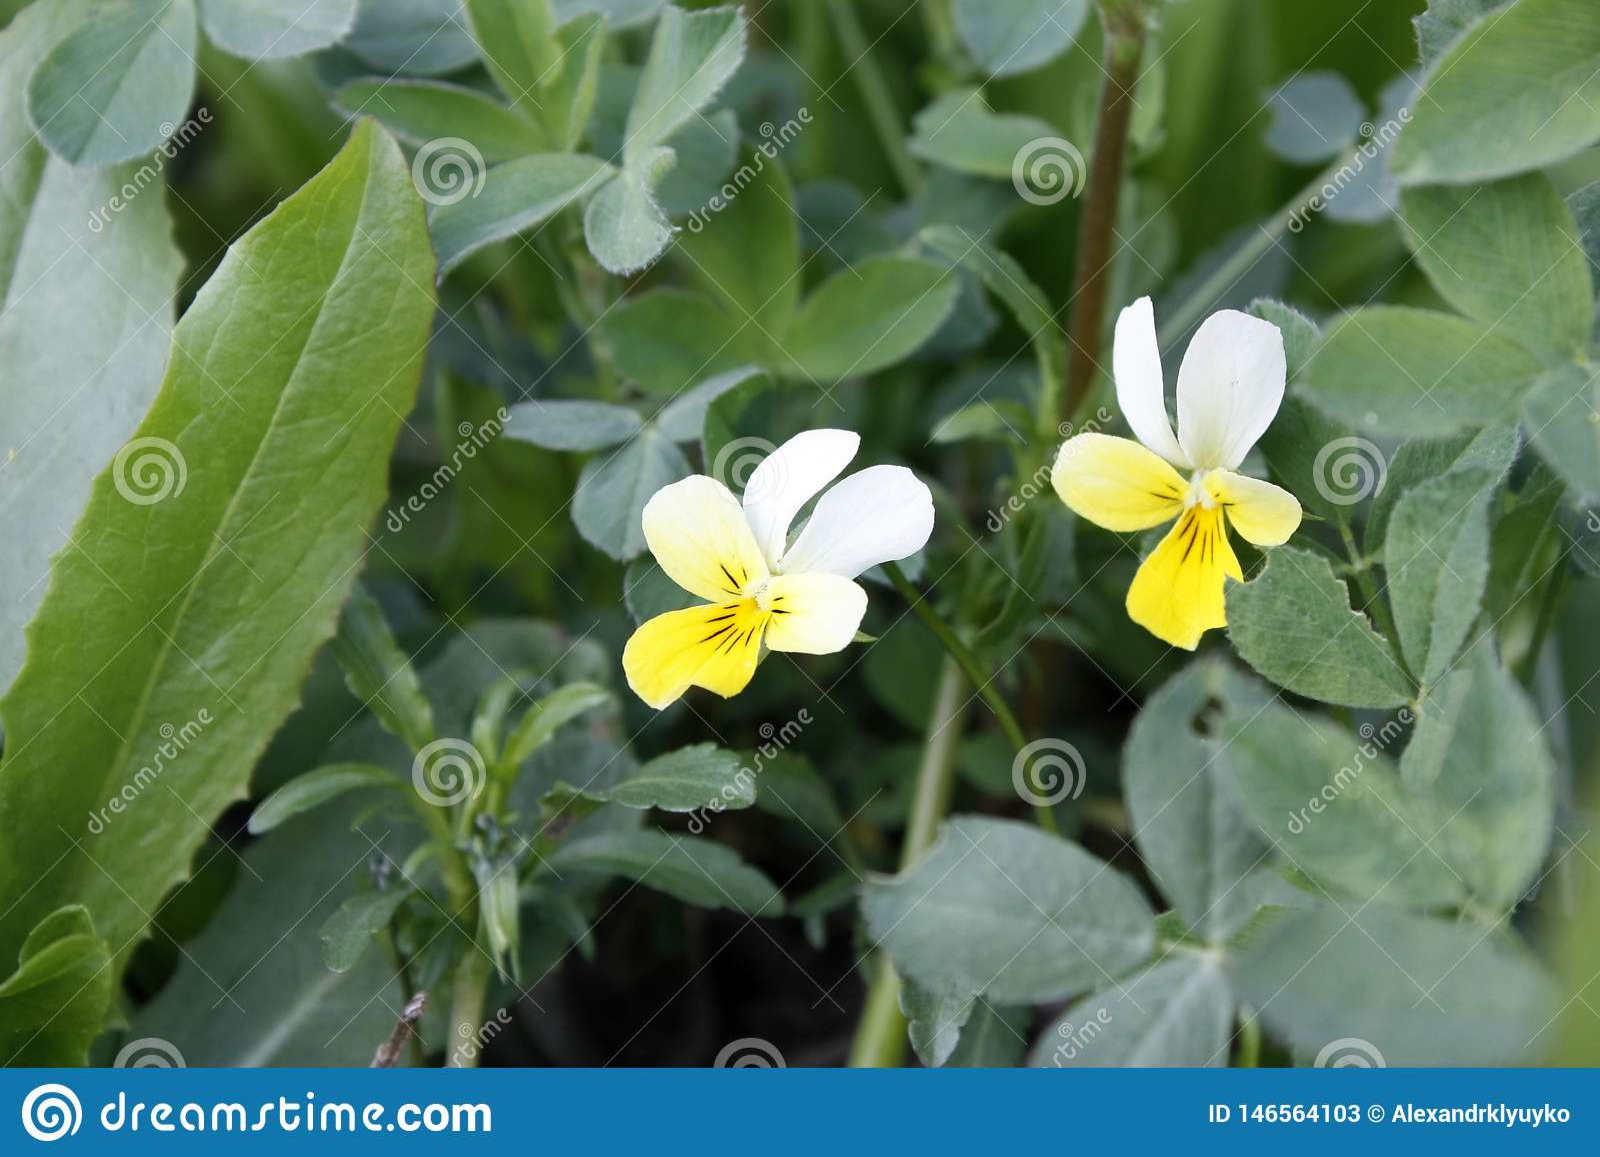 Gr?n ny v?xt av sl?ktet Trifolium som v?xer i tidig v?r Kan anv?ndas som en bakgrund eller en textur, n?rbild